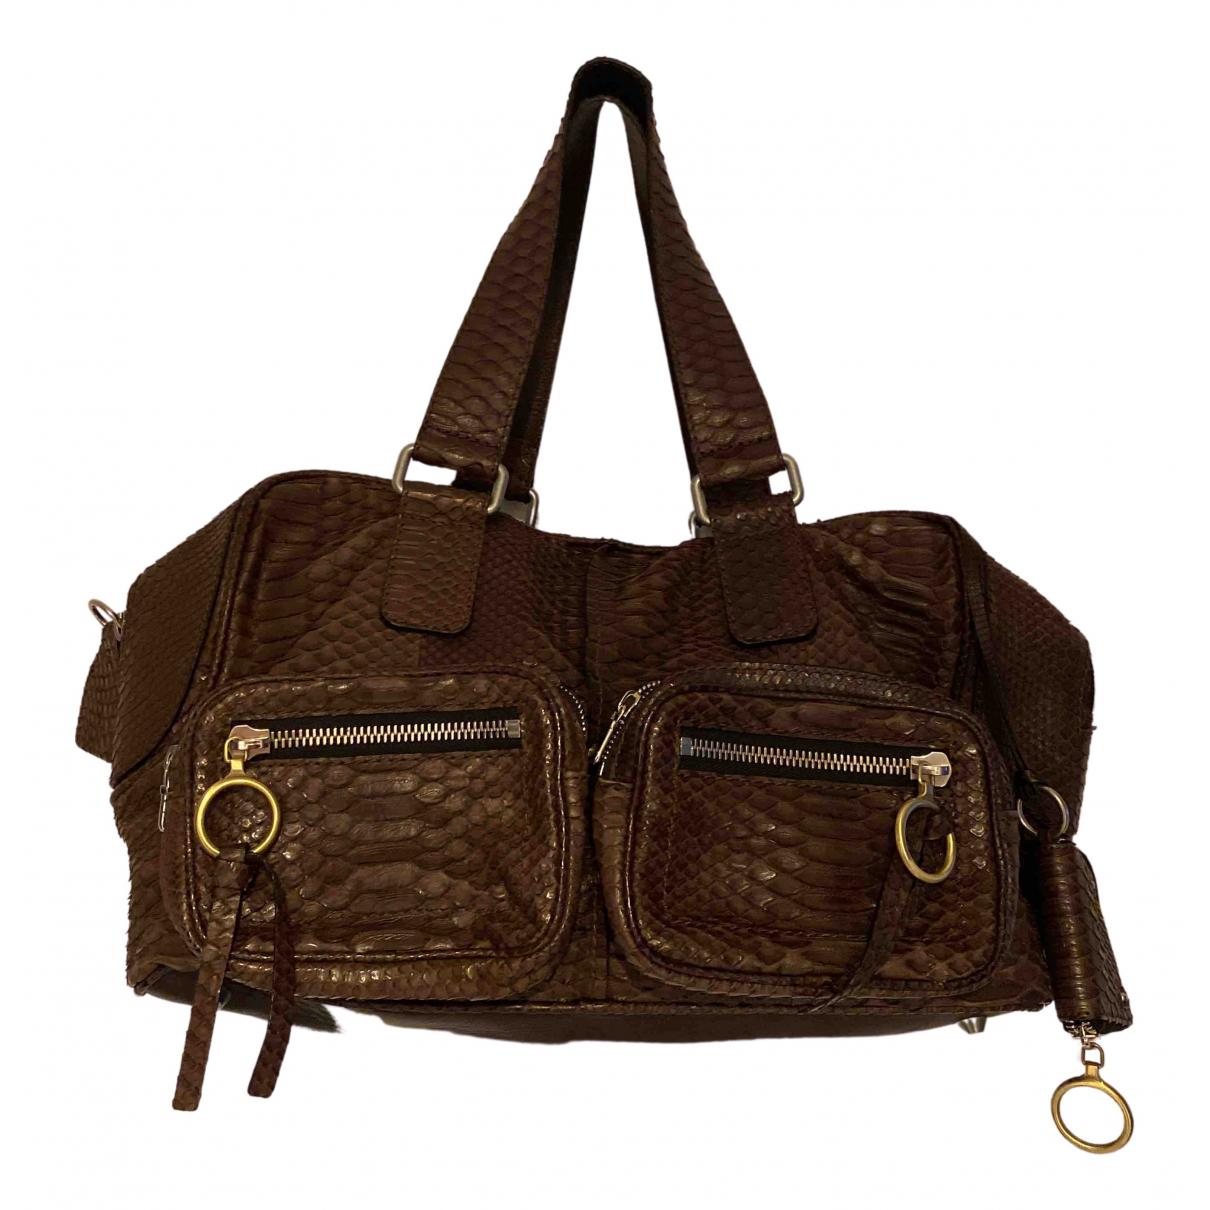 Chloé N Brown Python handbag for Women N